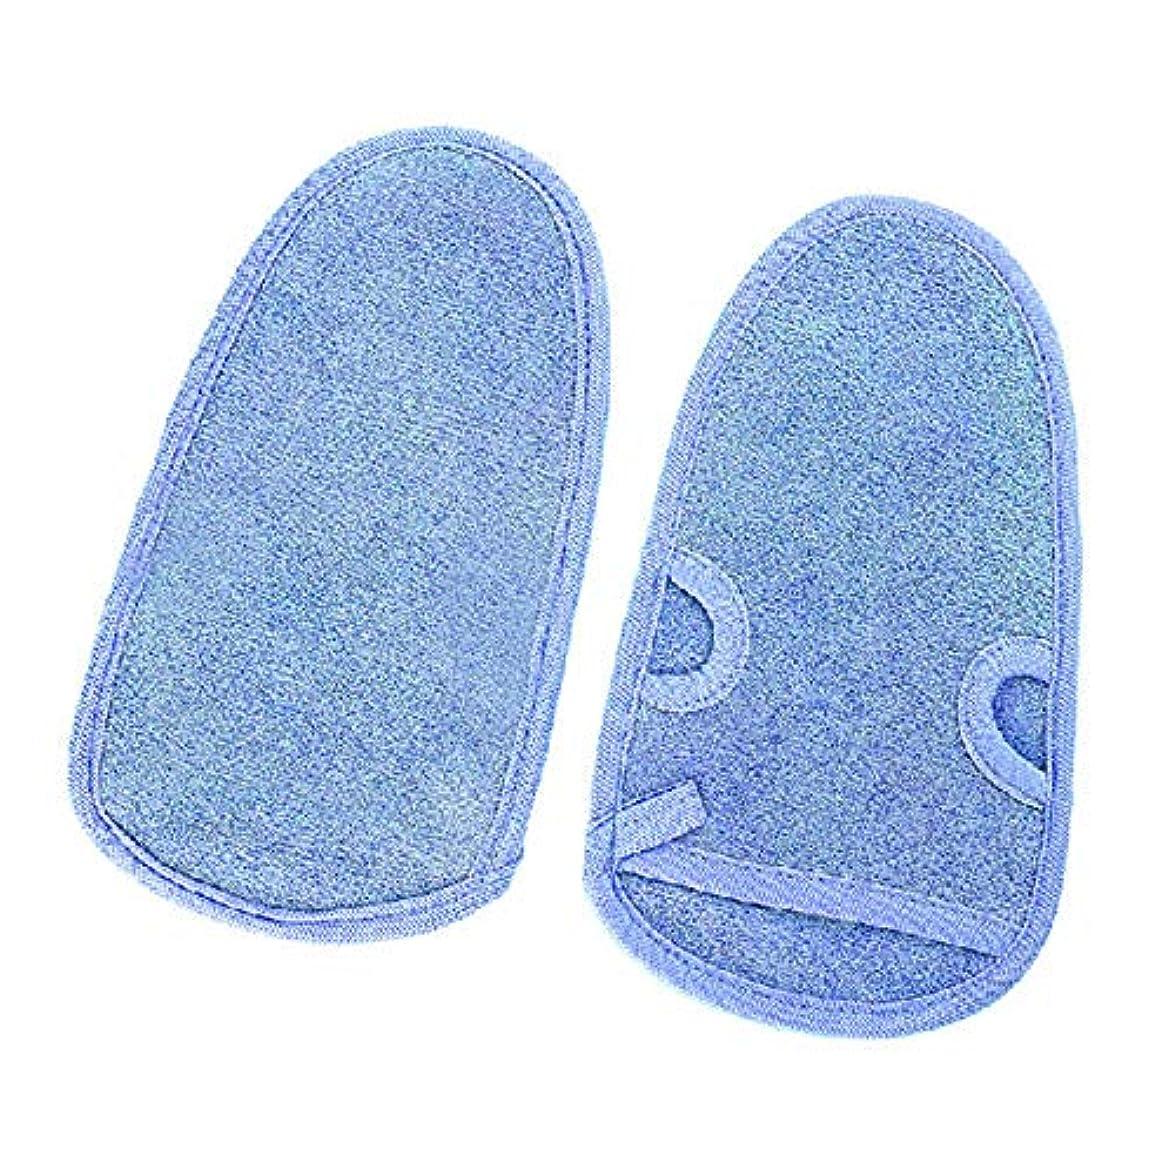 Kingsie 浴用手袋 2個セット あかすりミトン ボディ手袋 ボディタオル シャワーグローブ 入浴用品 毛穴清潔 角質除去 男女兼用 (ブルー)